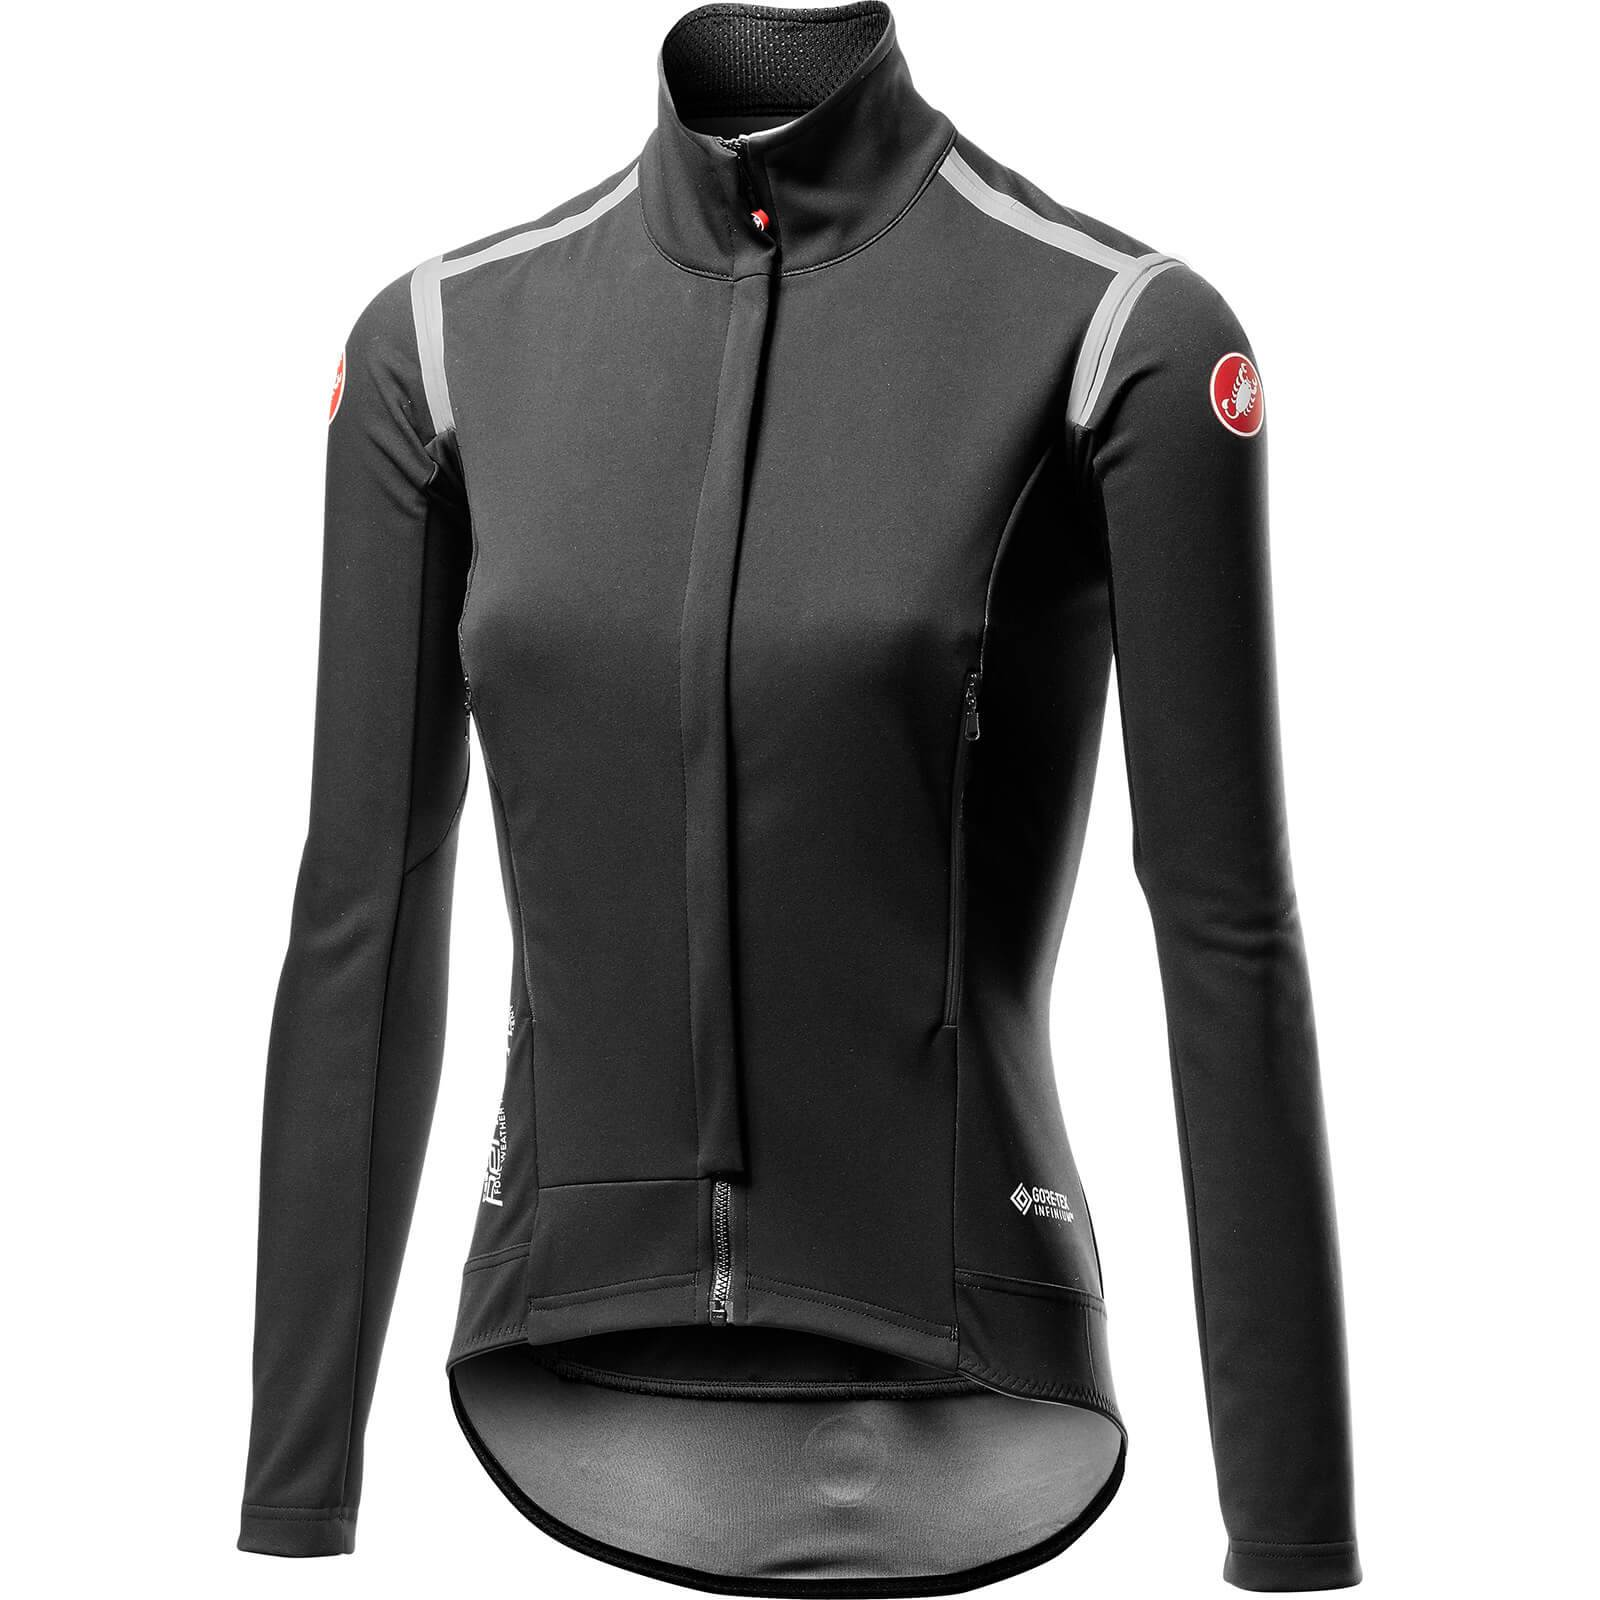 Castelli Women's Perfetto RoS Long Sleeve Jacket - Light Black - L - Light Black; female